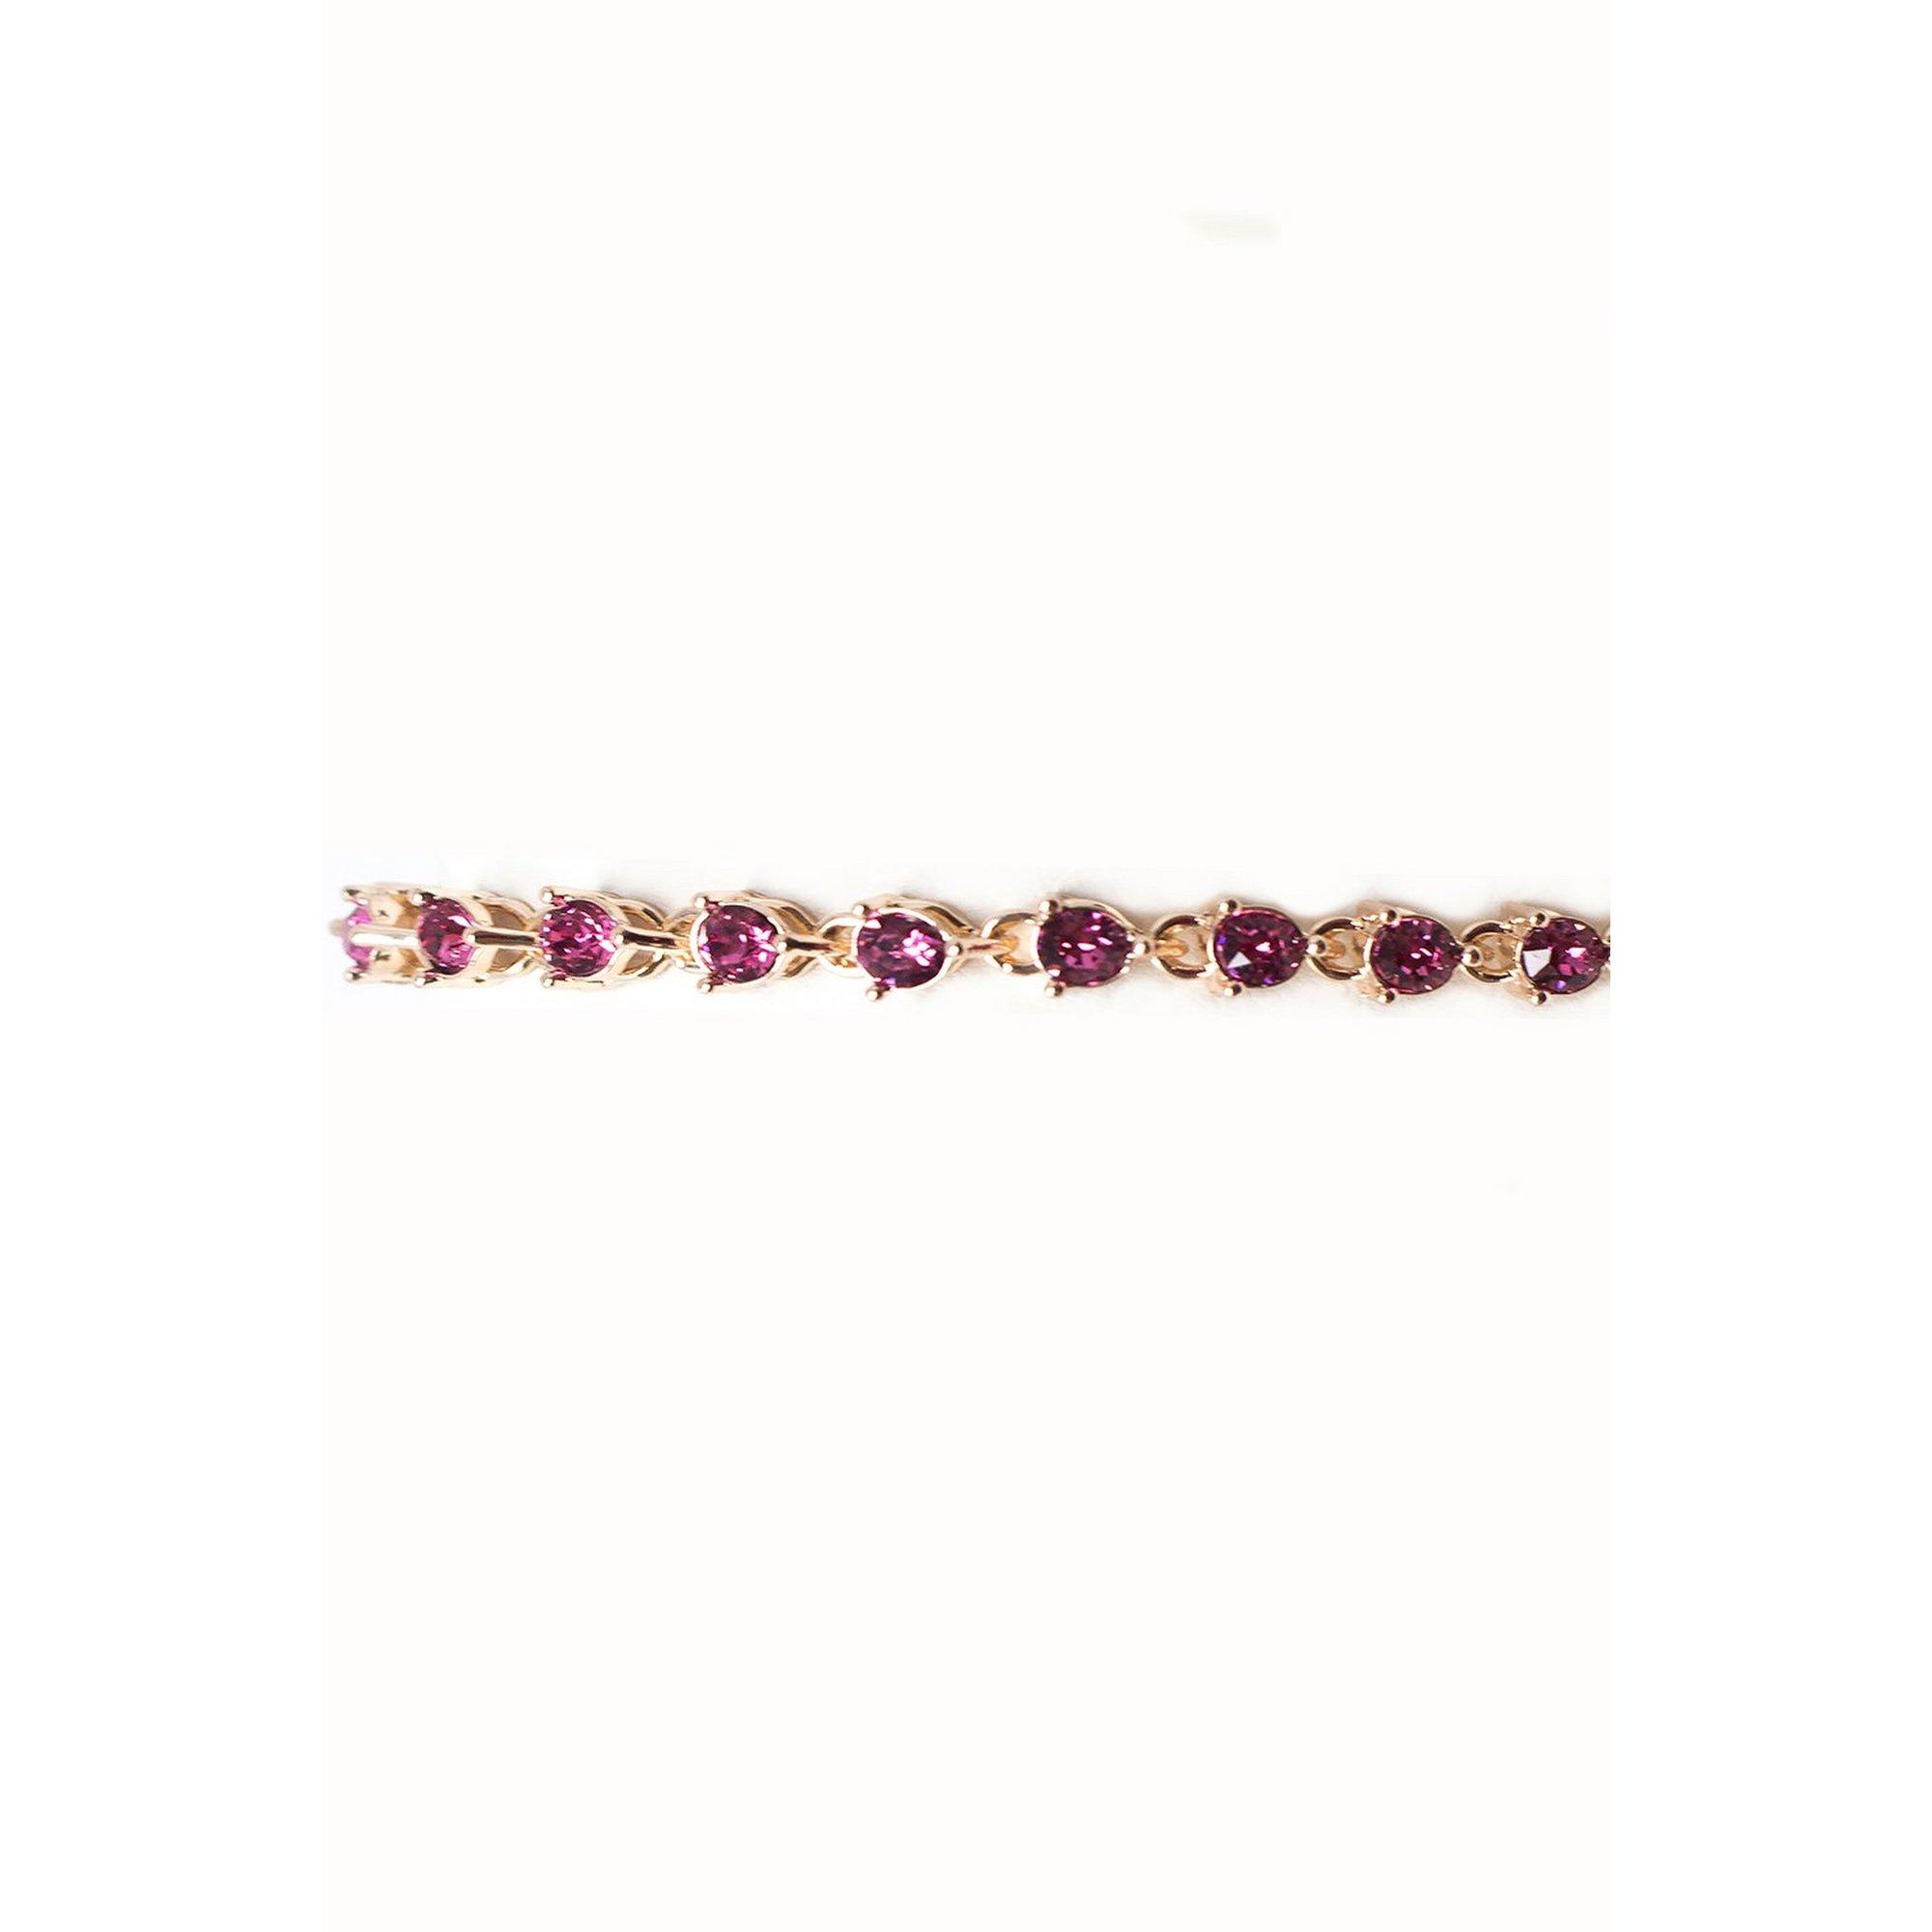 Image of Eternity Rose Gold Bracelet with Swarovski Elements